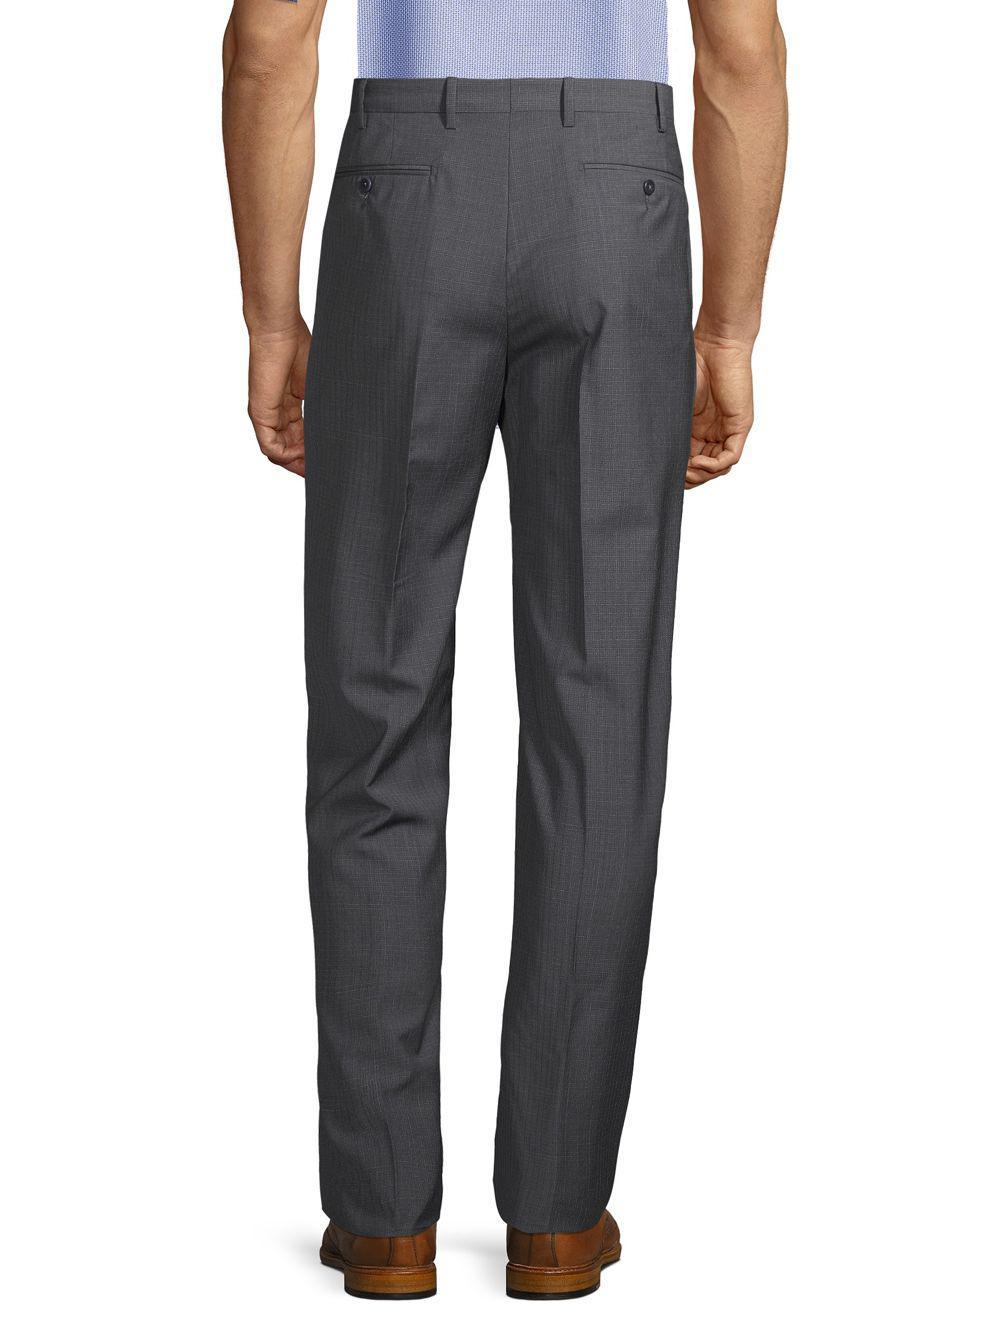 bec308191f Zanella - Gray Textured Solid Dress Pants for Men - Lyst. View fullscreen